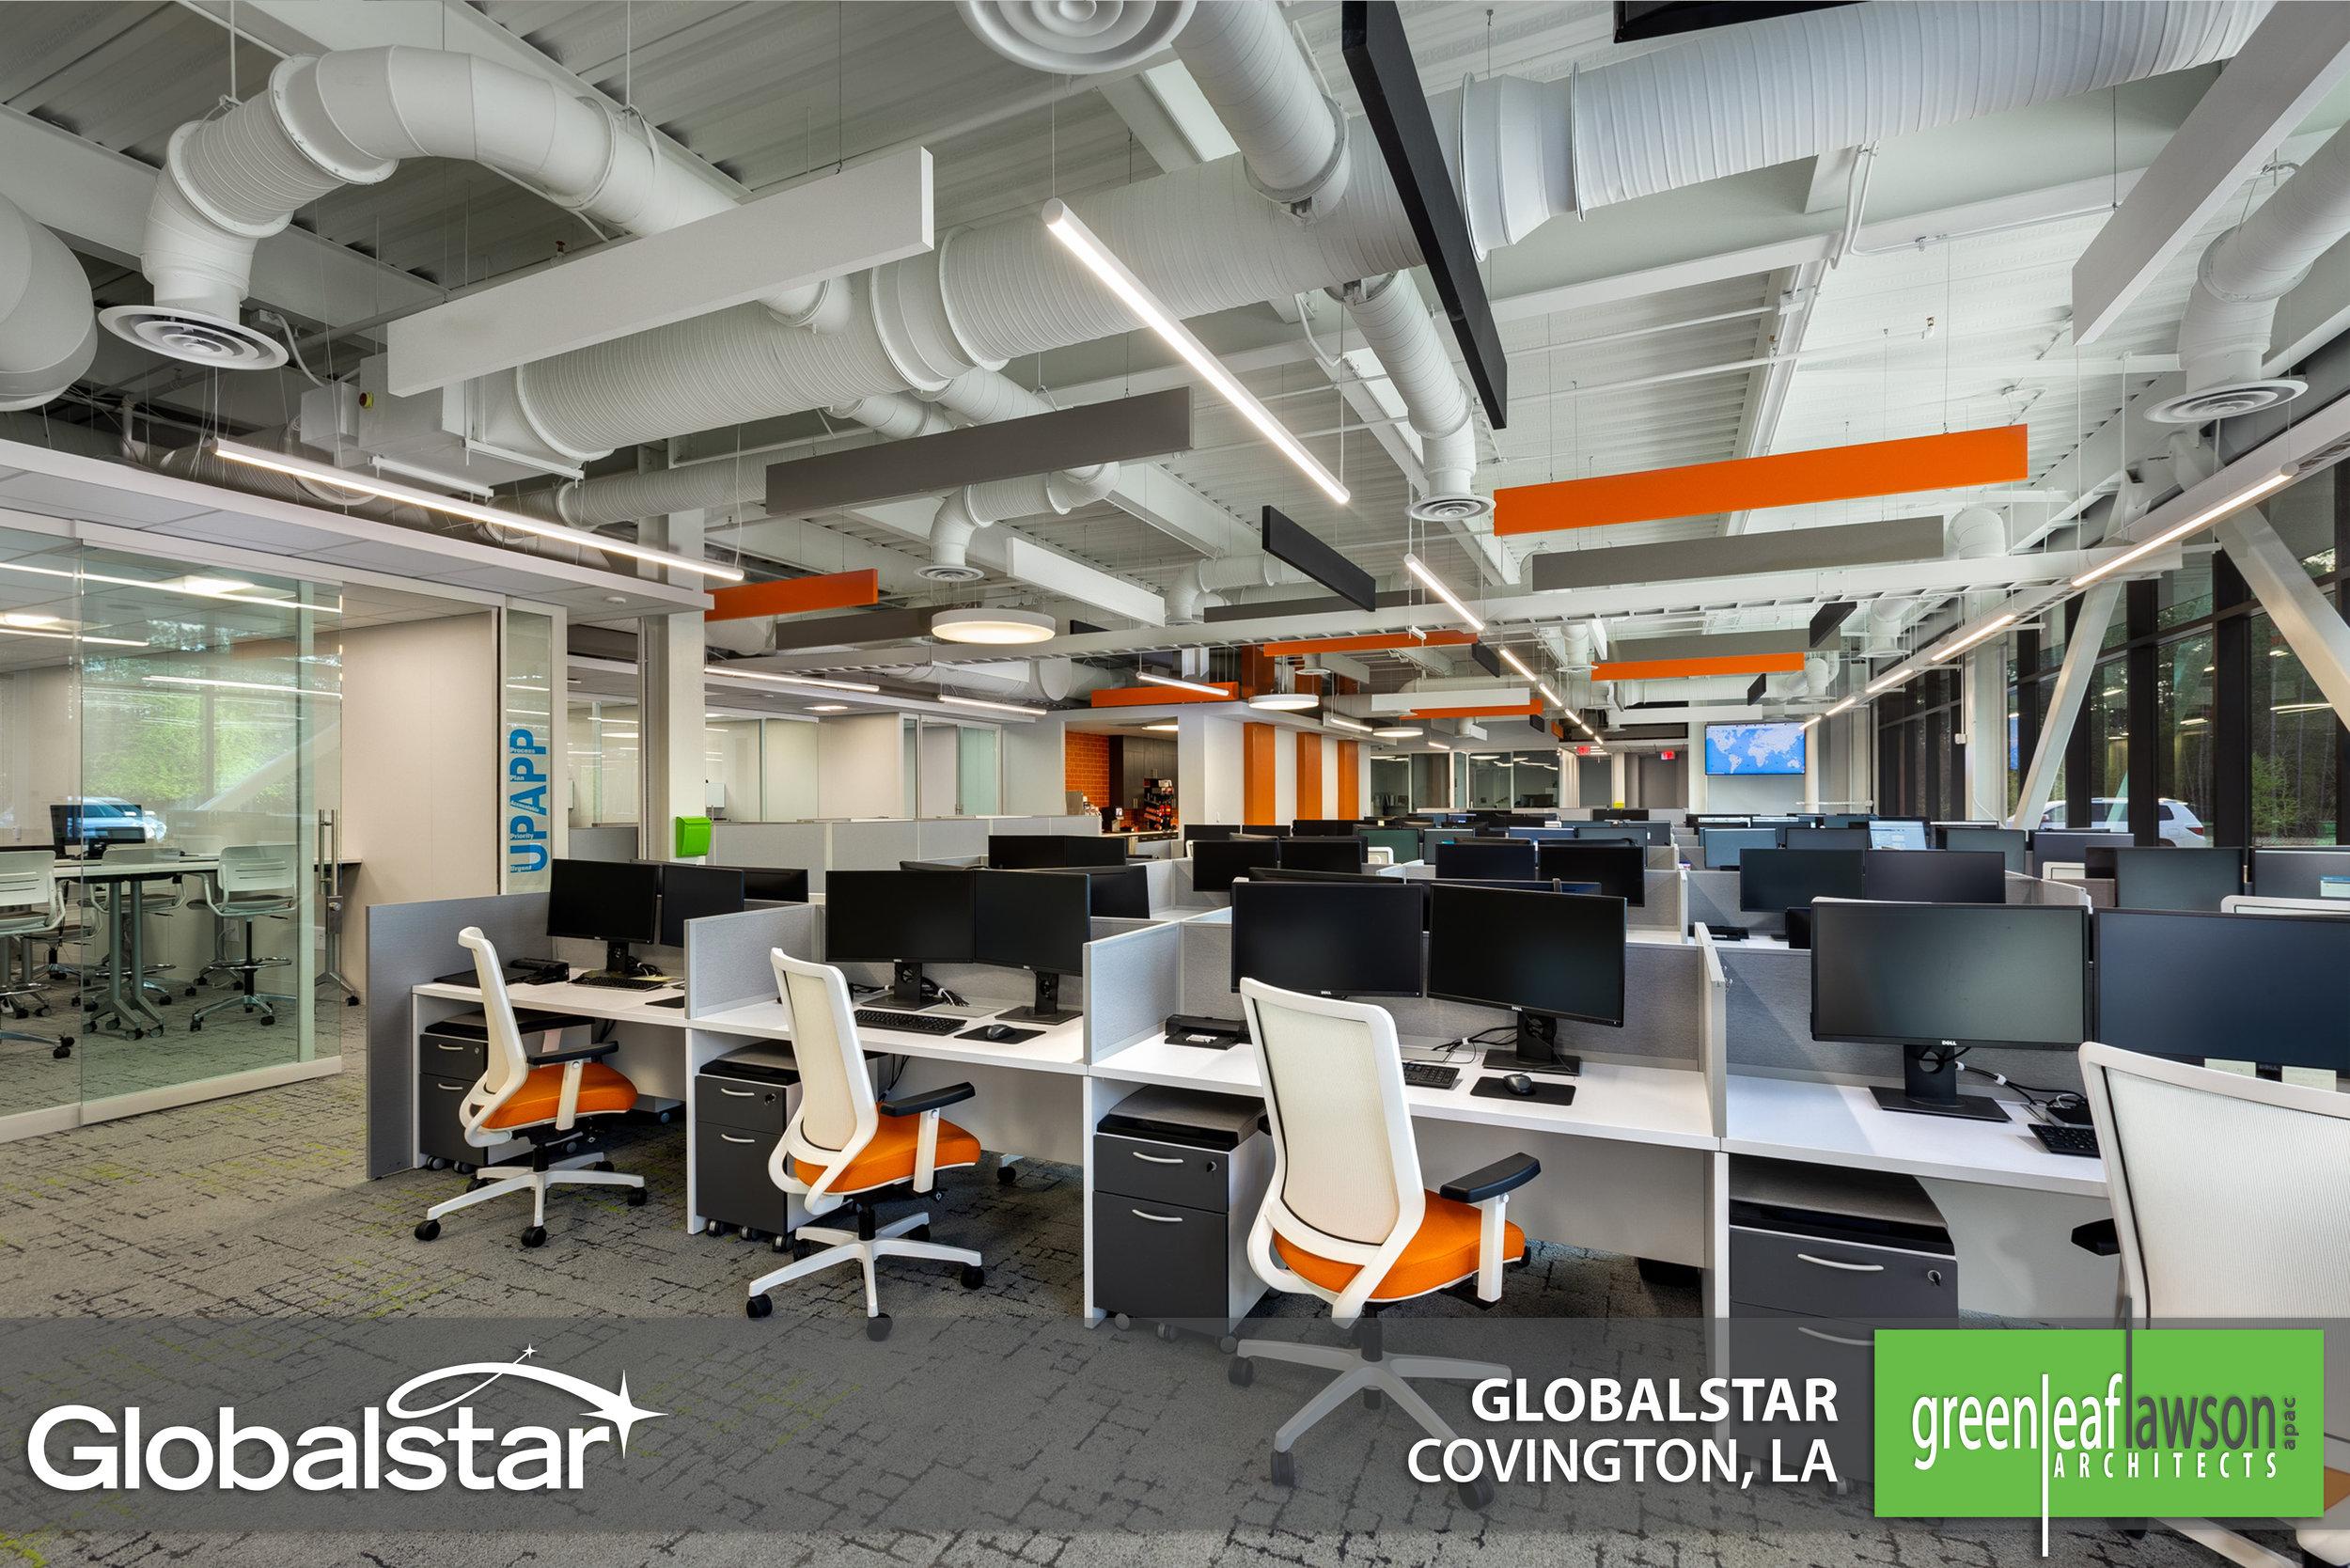 Globalstar 2.jpg